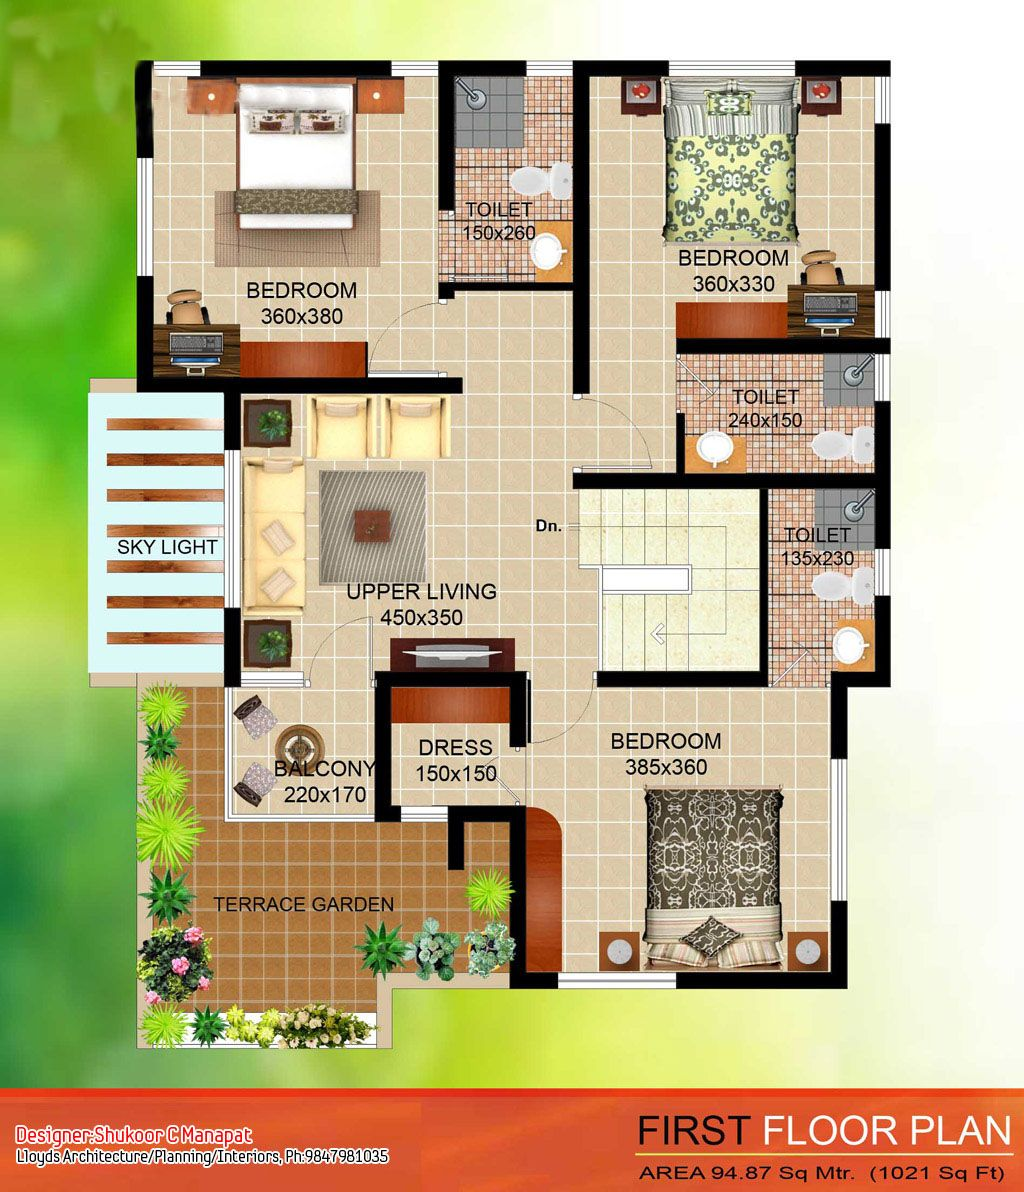 4 Bedroom House Kerala Floor Plan L F4a6b5527832fcd5.